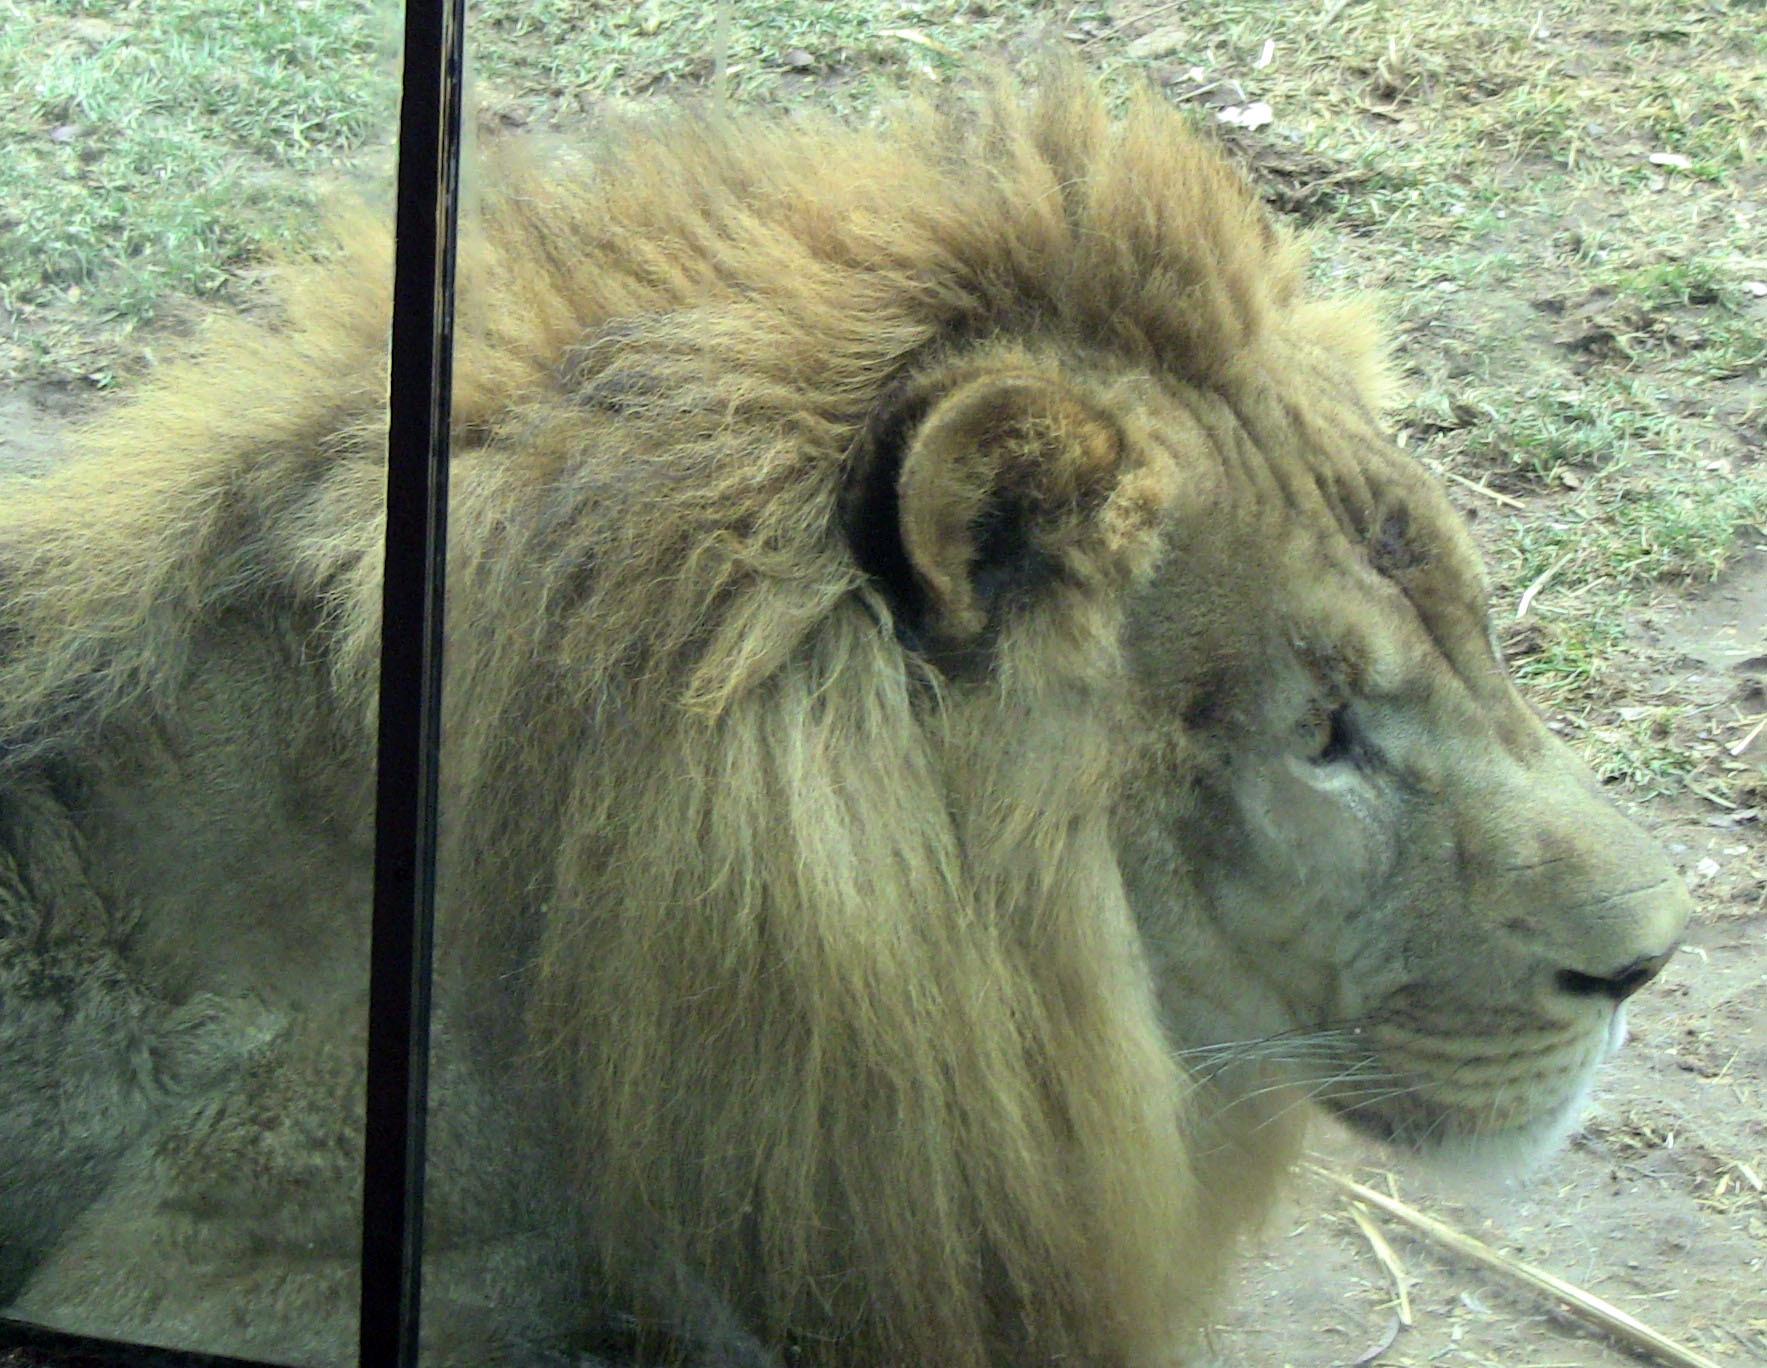 2930ac513454ddd30516_Cubs_at_zoo_-_lion.jpg